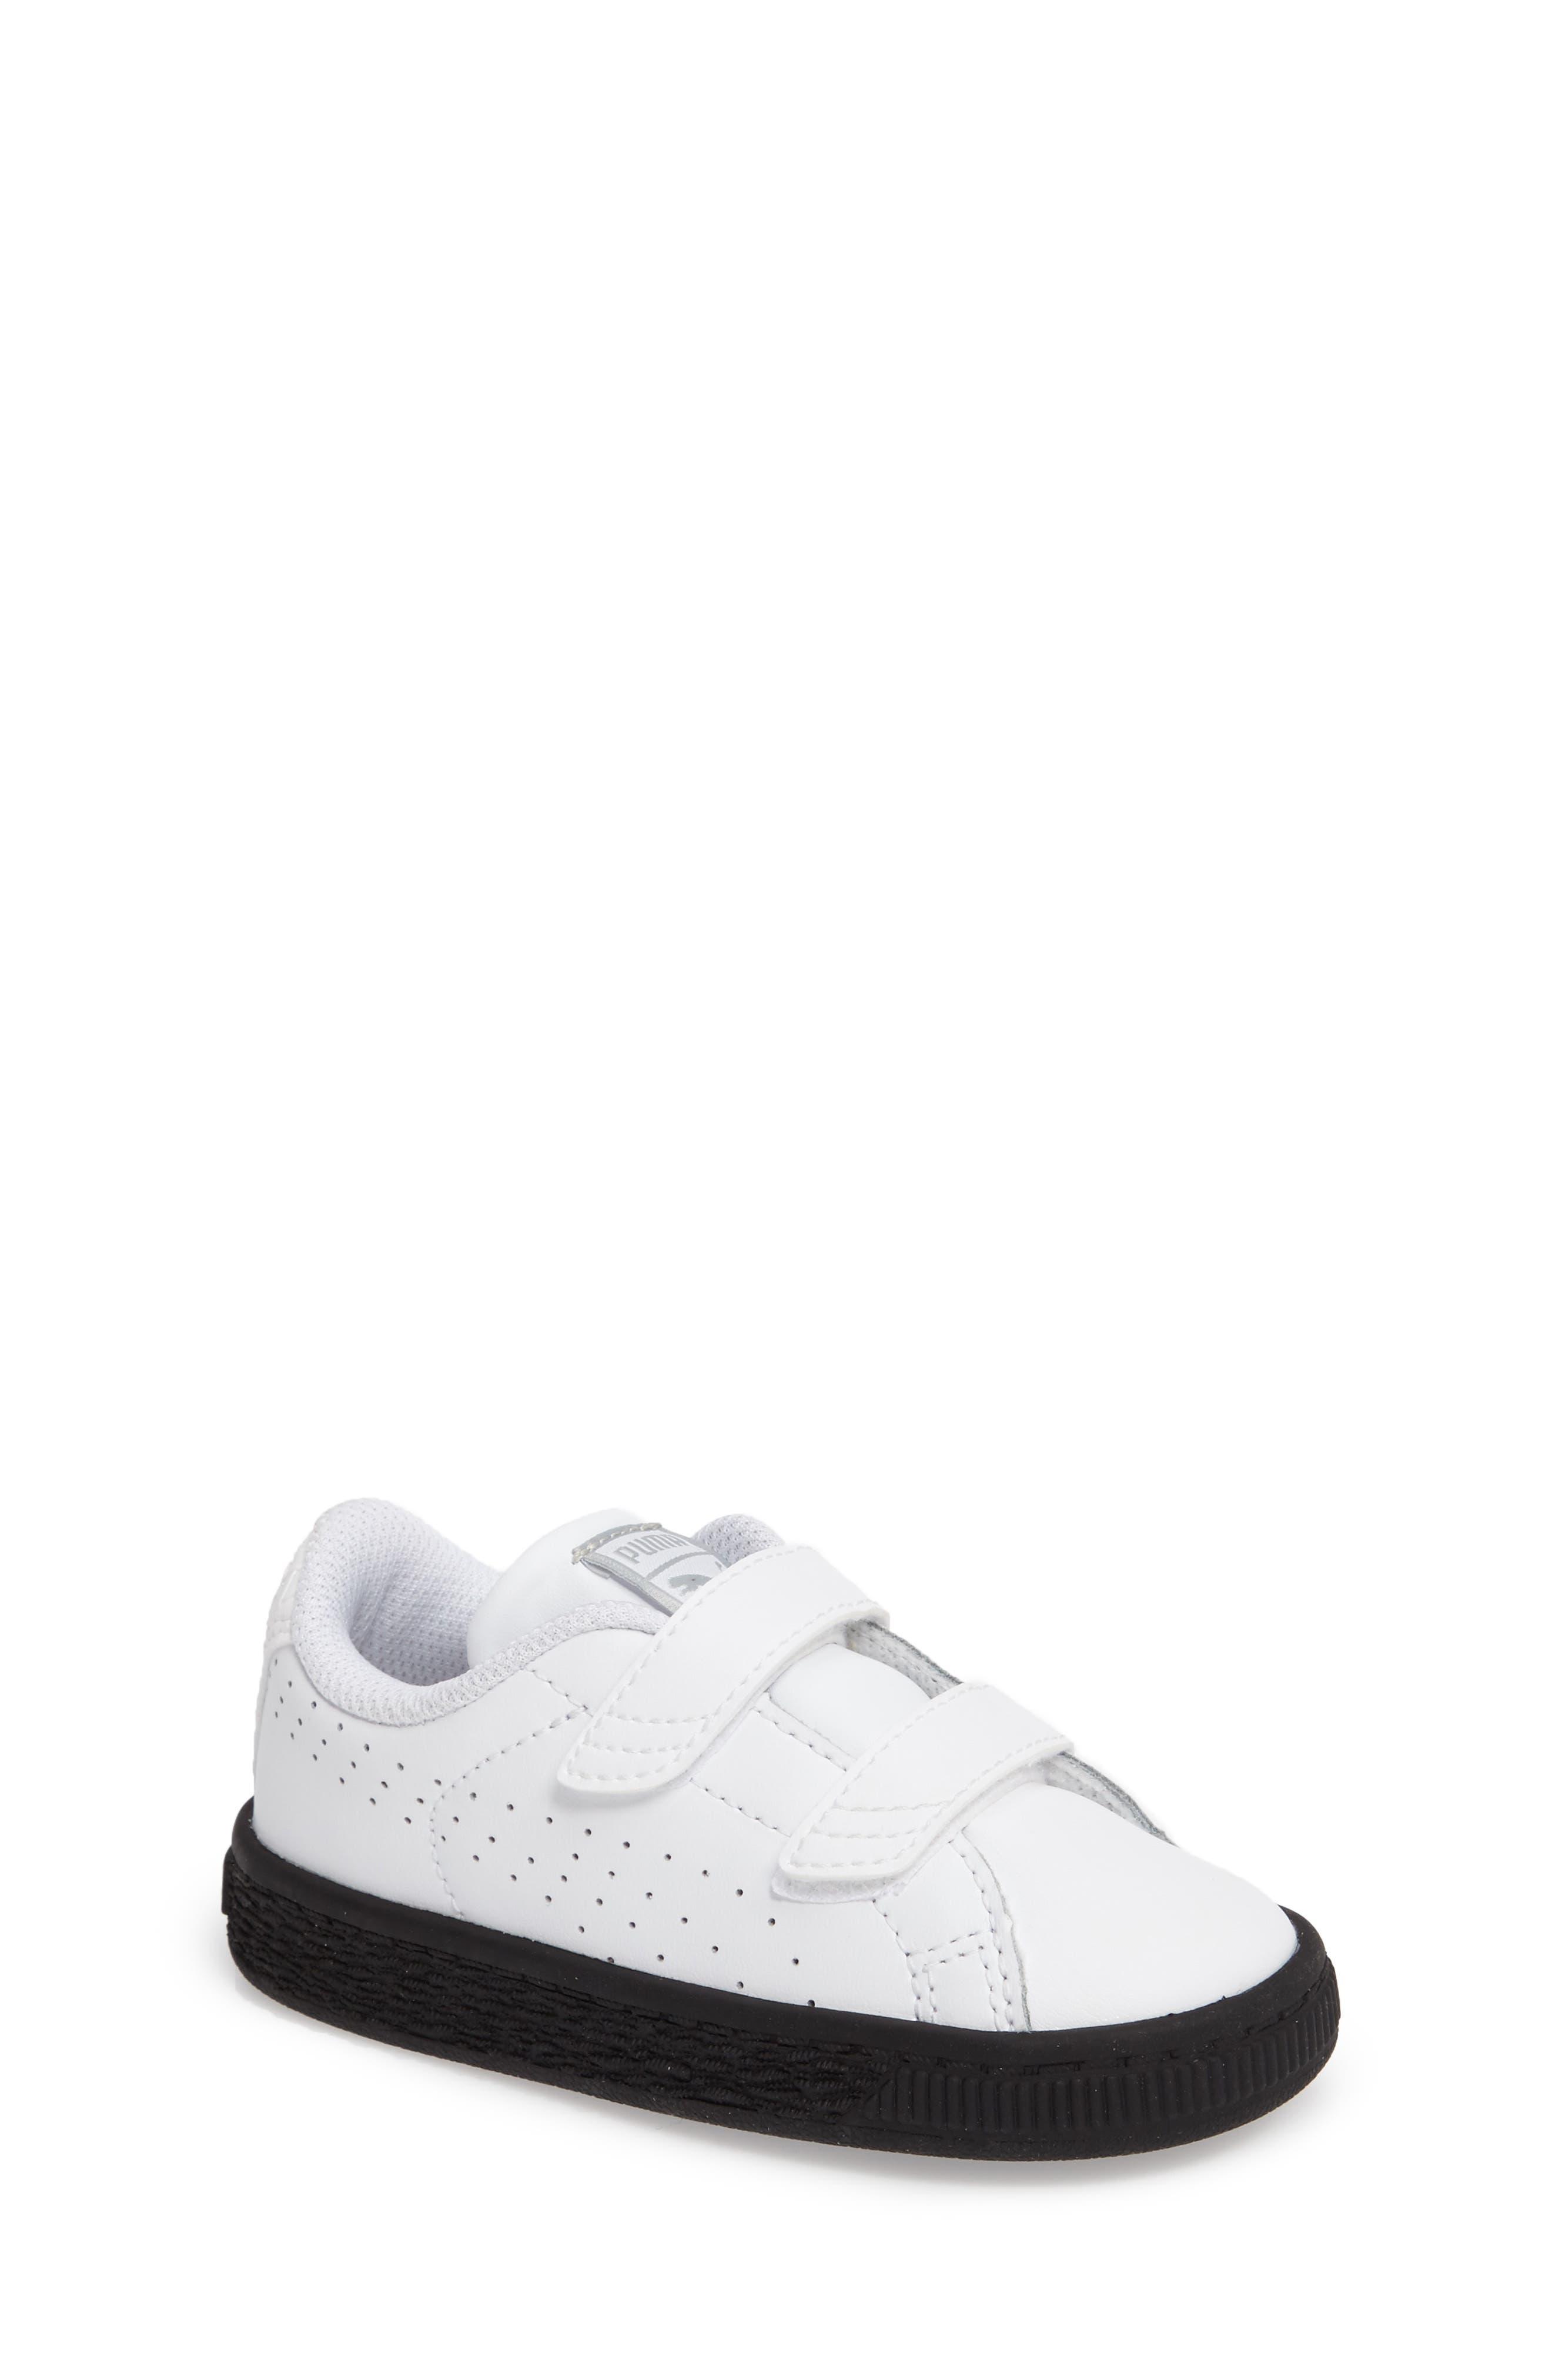 Basket Classic Sneaker,                         Main,                         color, White